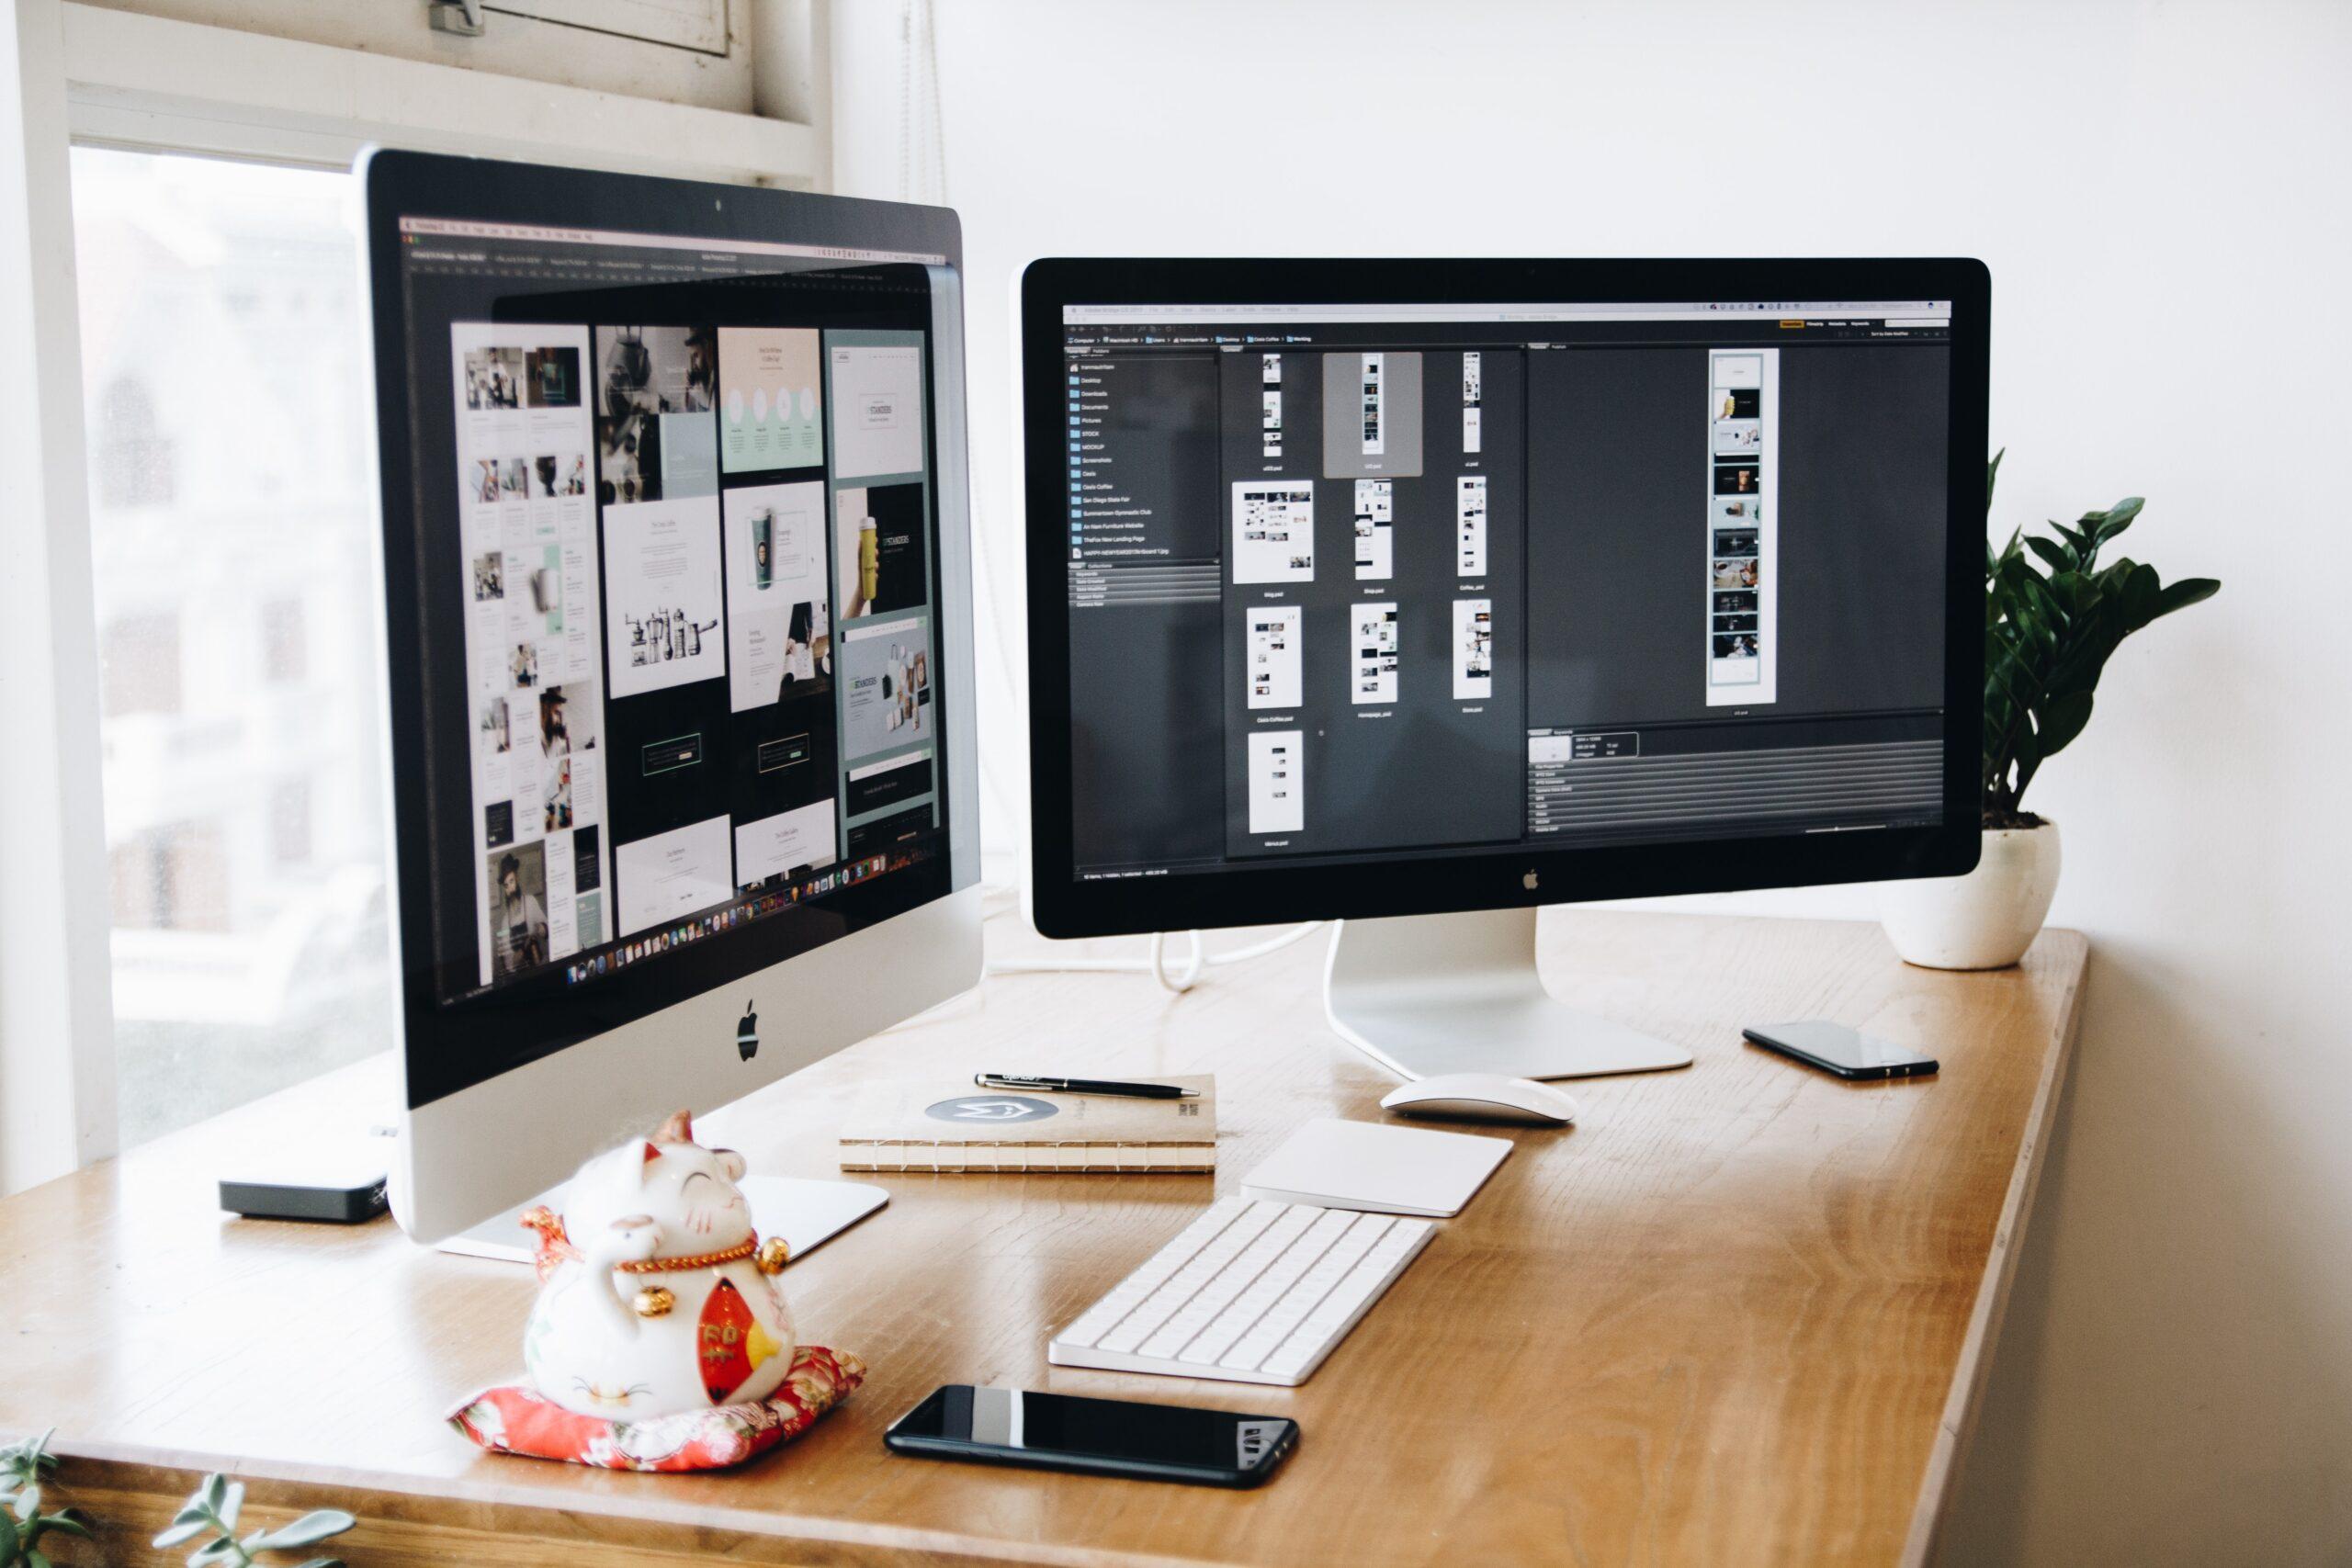 wordpress website maken, website maken wordpress, wordpress website maken handleiding